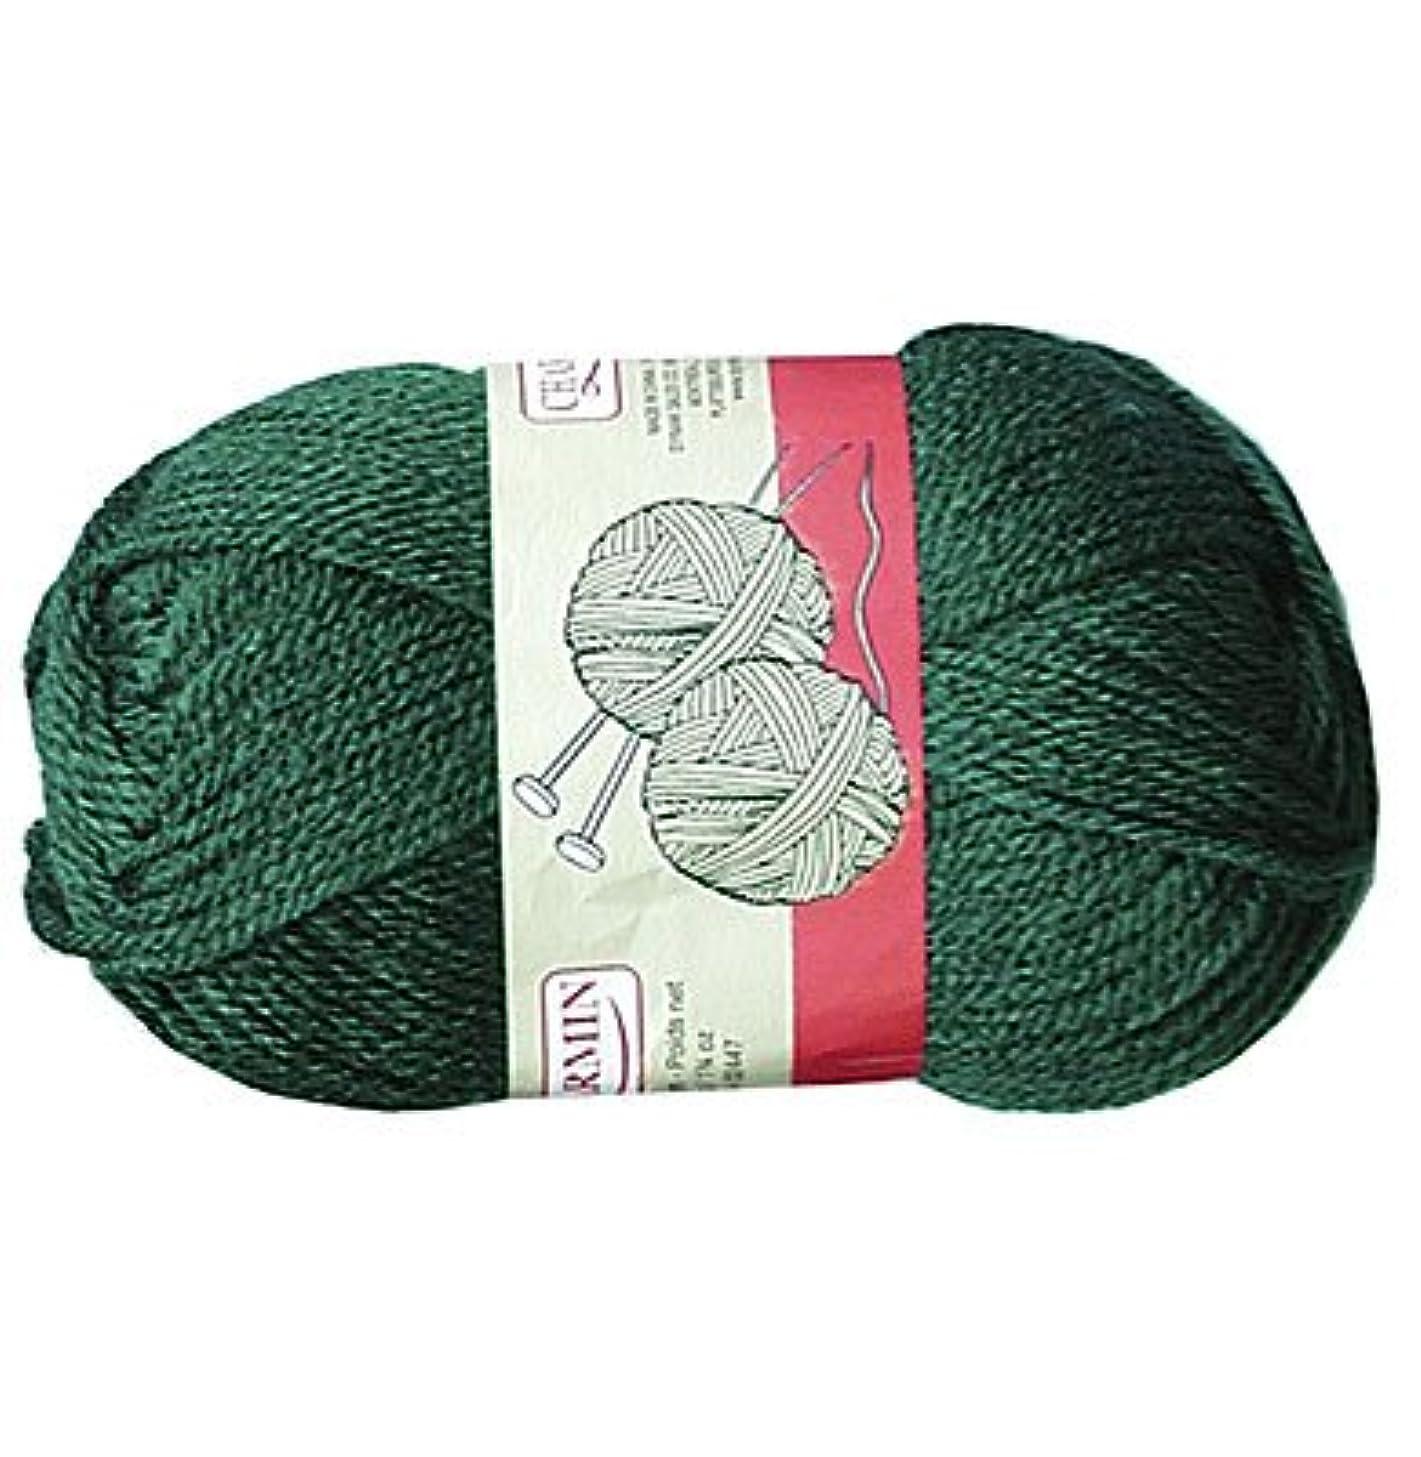 Charmin Knitting Yarn 50g Forest Green